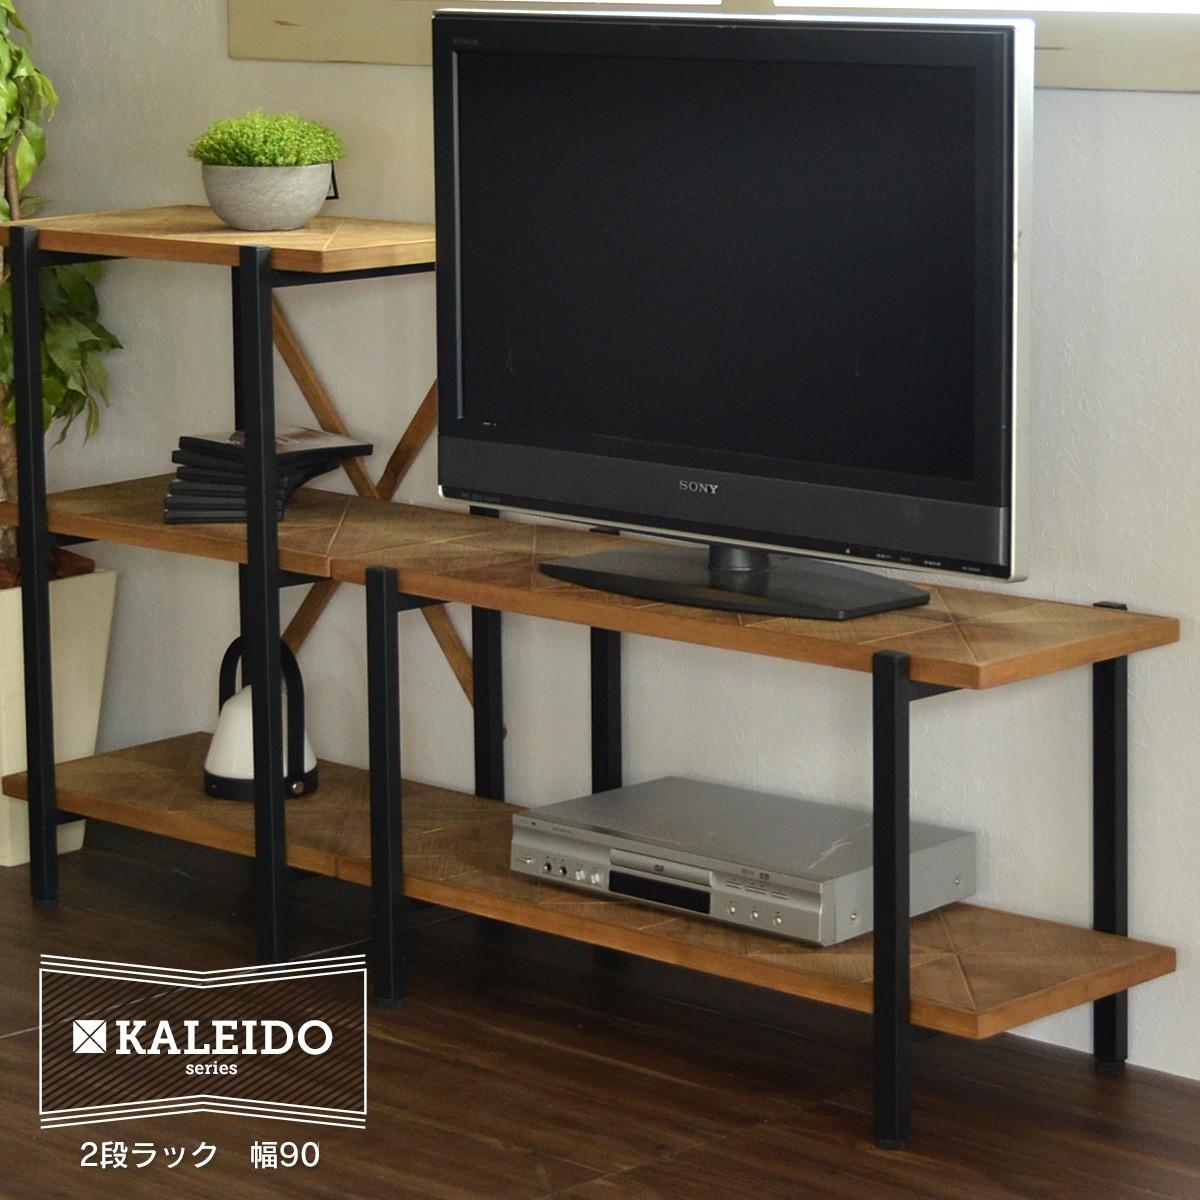 KALEIDO カレイド 2段ラック 幅90 オープン 収納 木製 棚 本棚 シェルフ 間仕切り ディスプレイ コンパクト スリム 省スペース 一人暮らし リビング おしゃれ デザイン